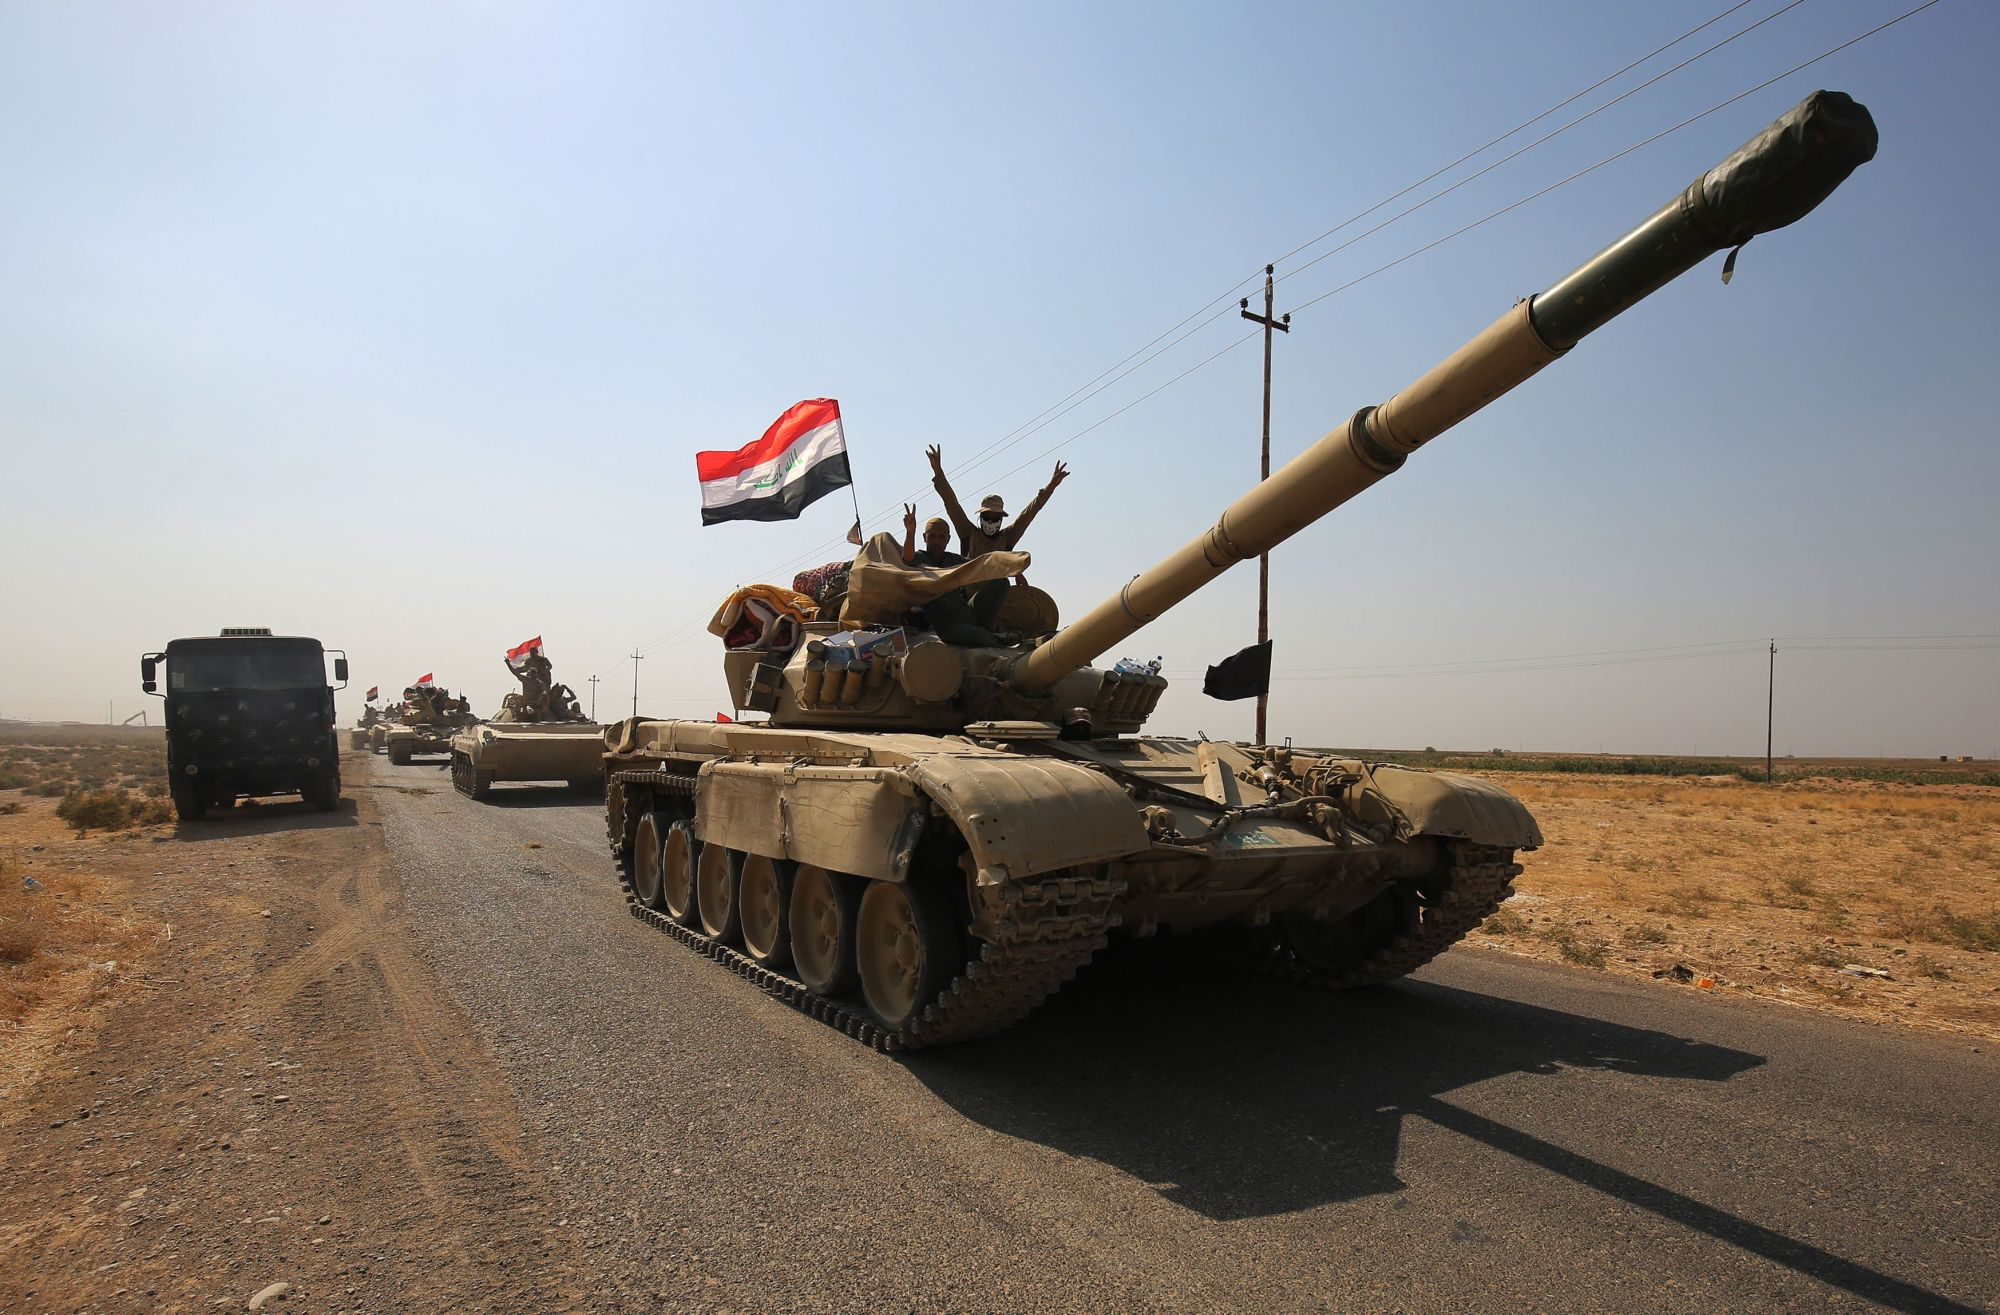 Image Iraqi forces drive towards Kurdish peshmerga positions on October 15, 2017, on the southern outskirts of Kirkuk. (AHMAD AL-RUBAYE / AFP)